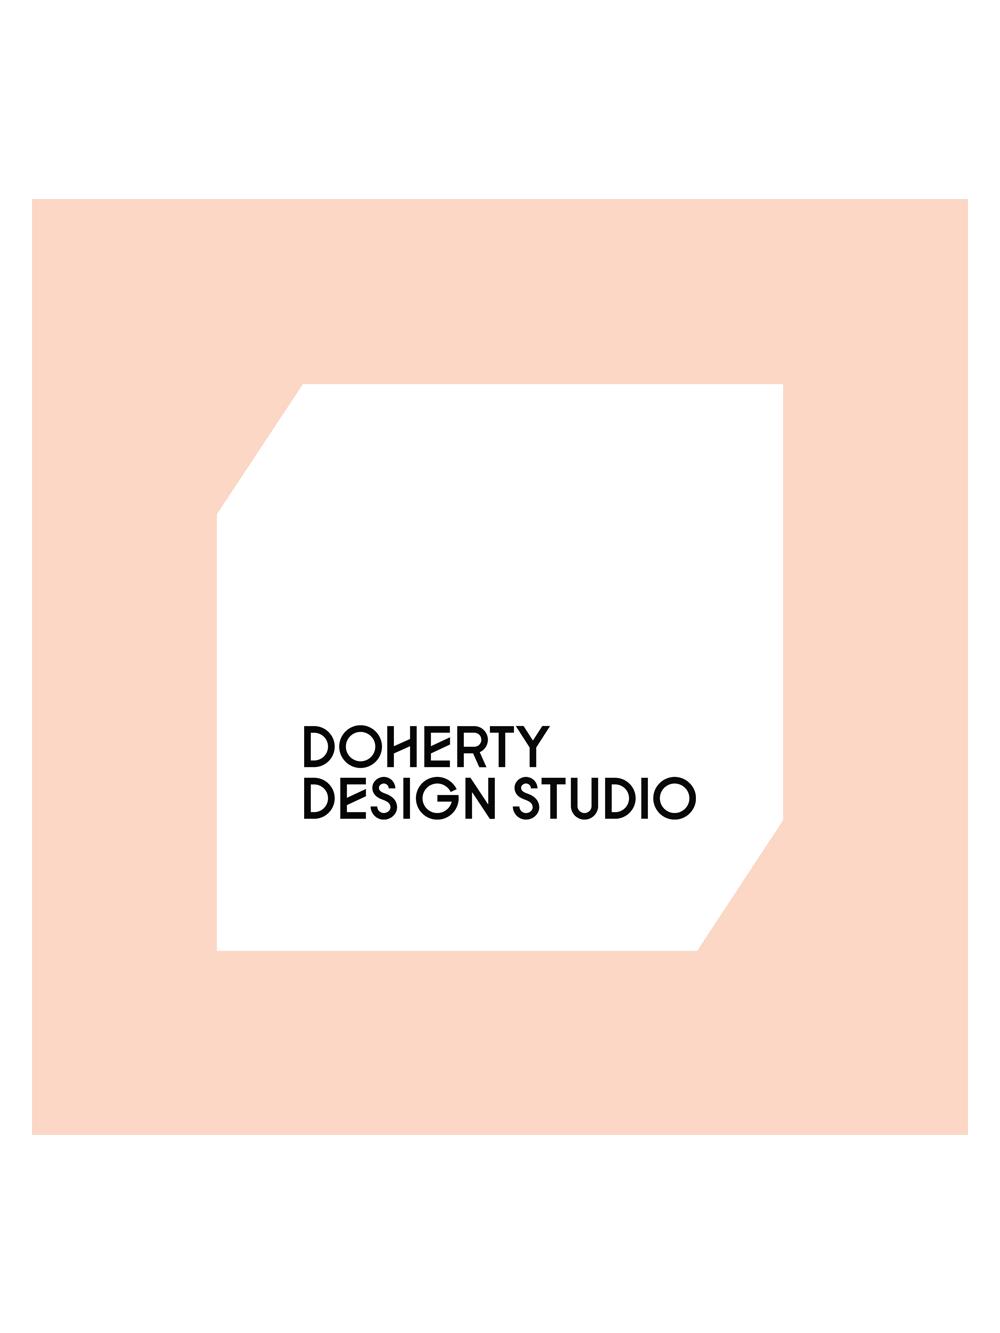 doherty-design-studio_1000x1333.png